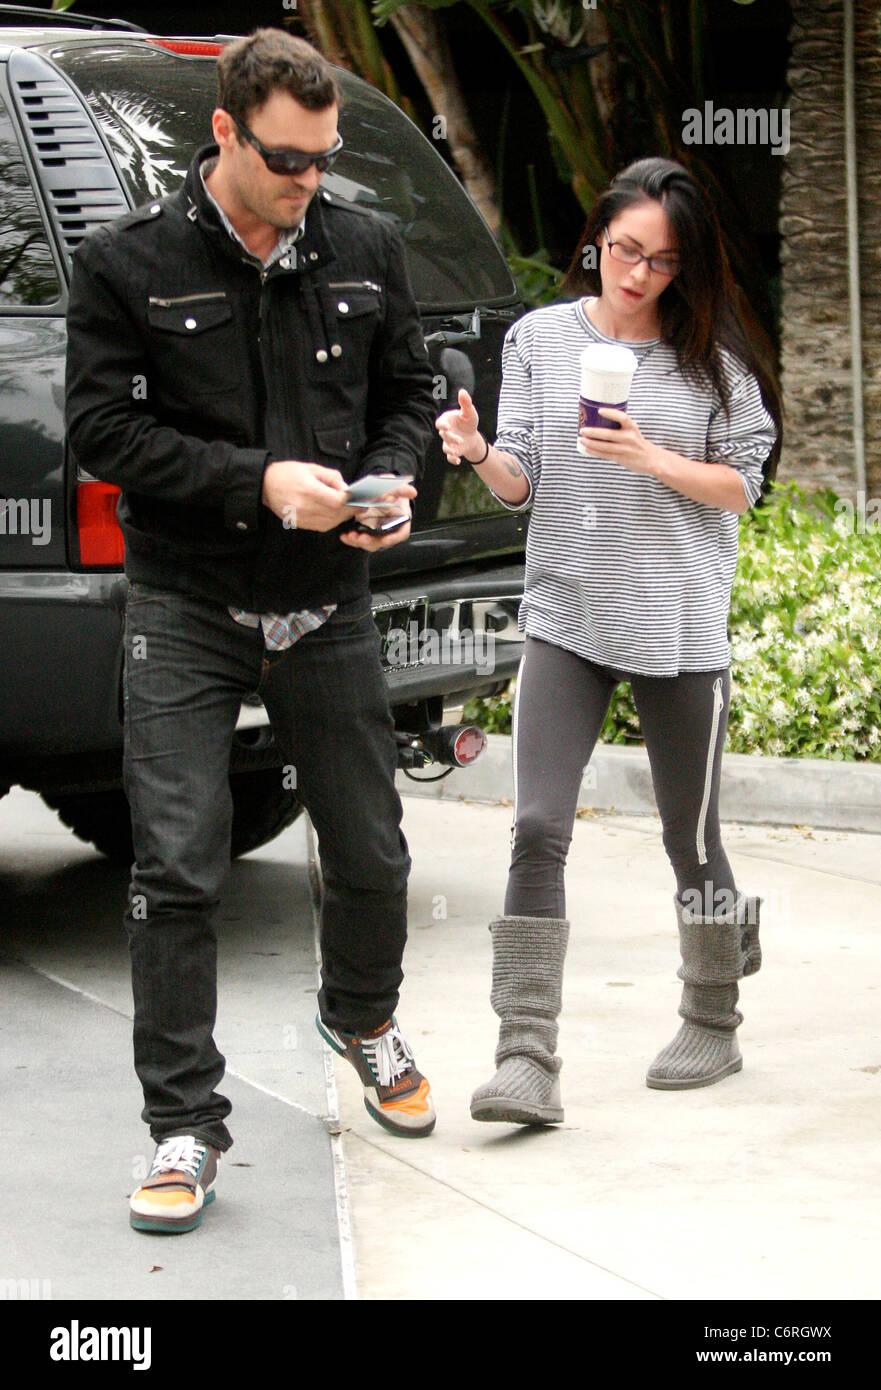 Brian Austin groene Megan Fox dating Ariana Grande dating vent uit de gezochte